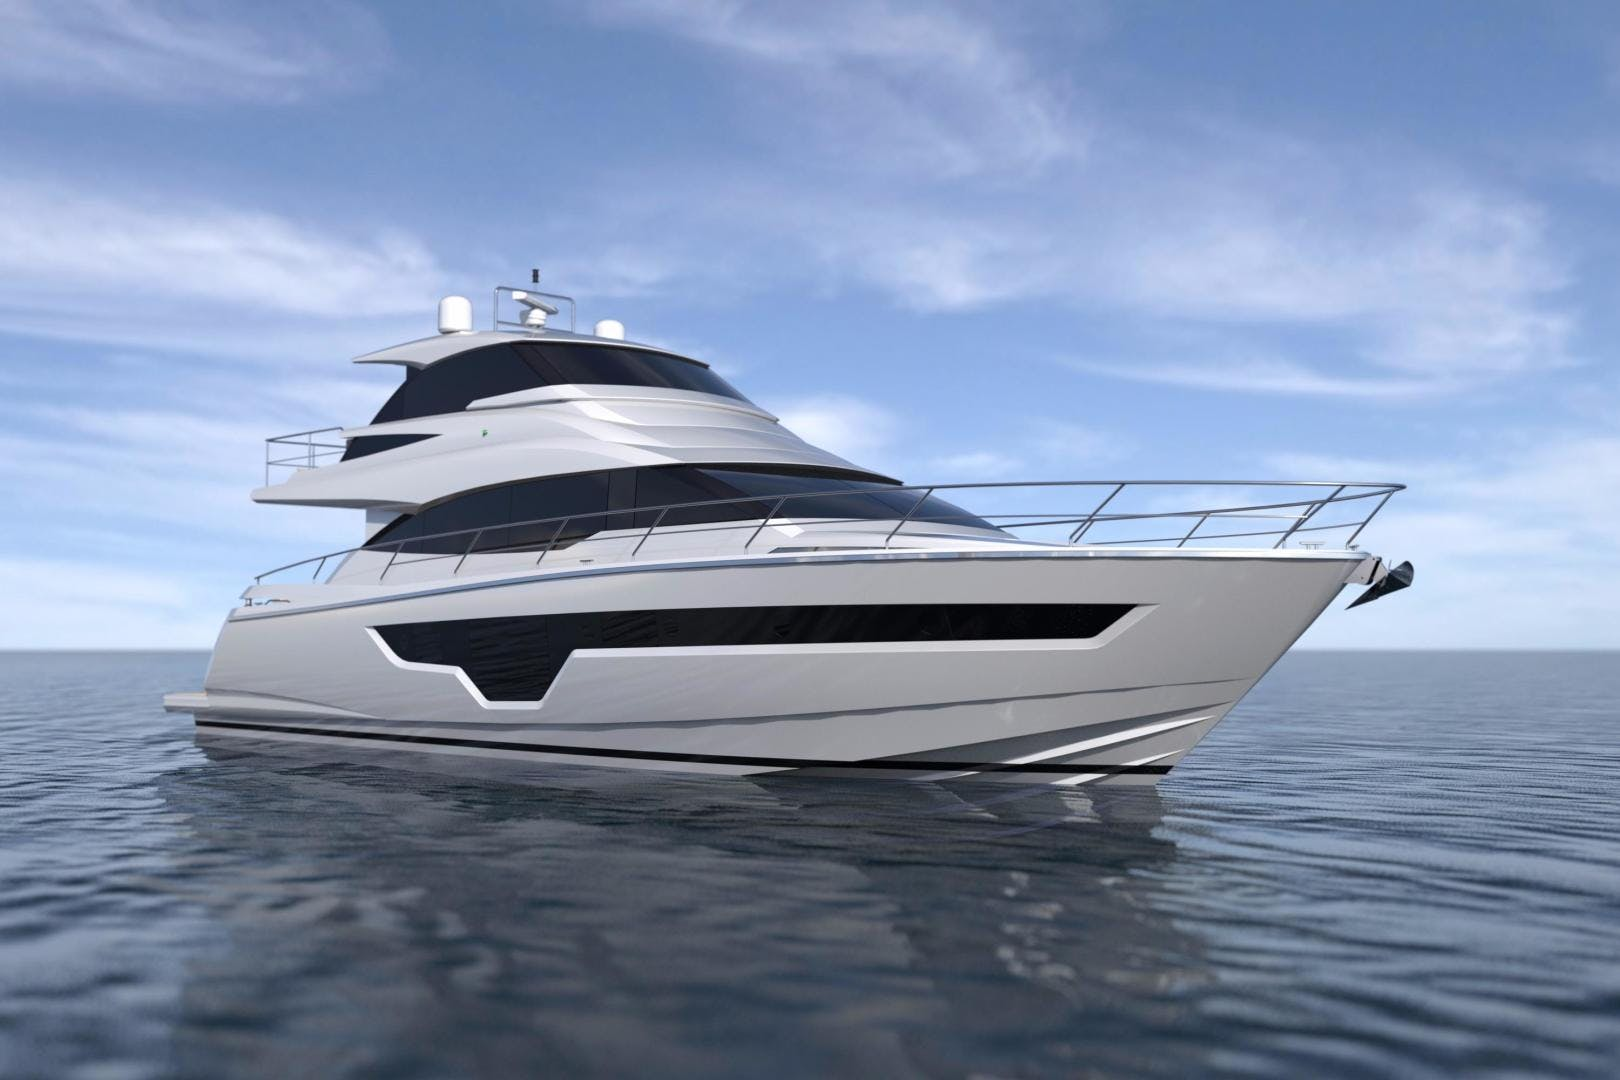 2020 Johnson 70' Skylounge Motor Yacht JOHNSON 70 SKYLOUNGE | Picture 3 of 19